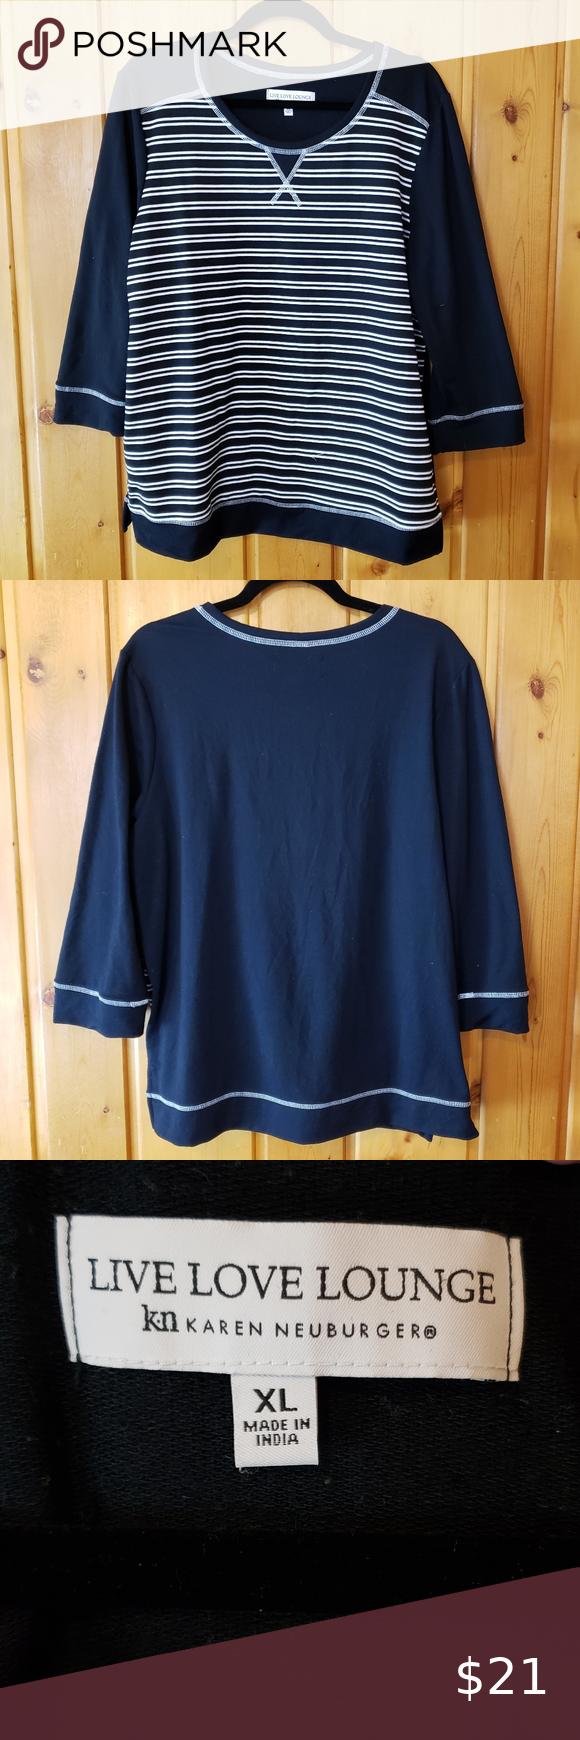 Live Love Lounge Sweatshirt